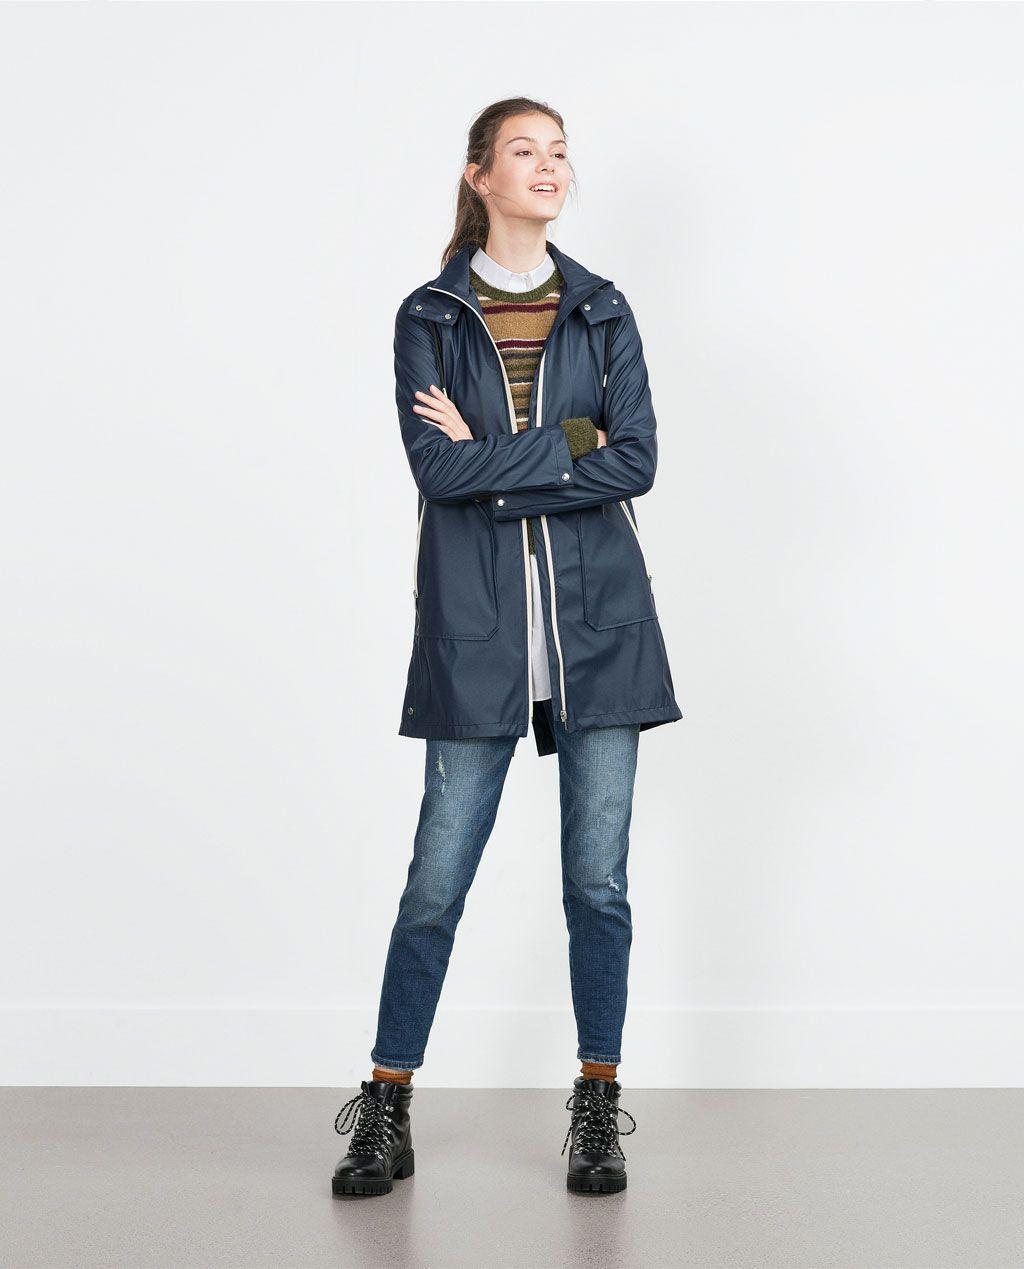 TrfZara In Navy States Raincoat Coats United 2019 ZiOPXuwkT